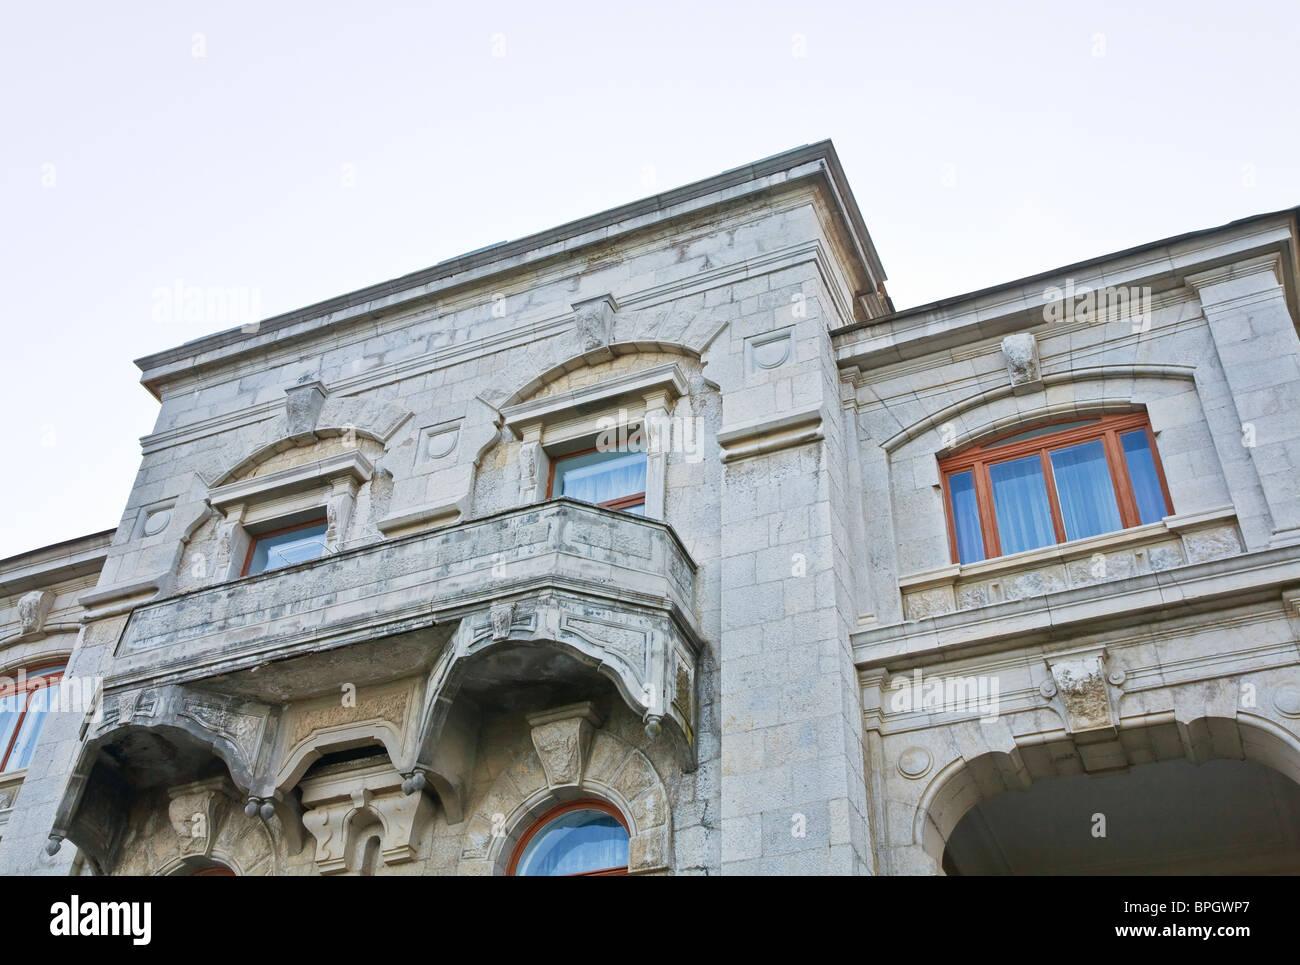 Fragment of Livadia Palace (summer retreat of the last Russian tsar, Nicholas II, Crimea, Ukraine). - Stock Image